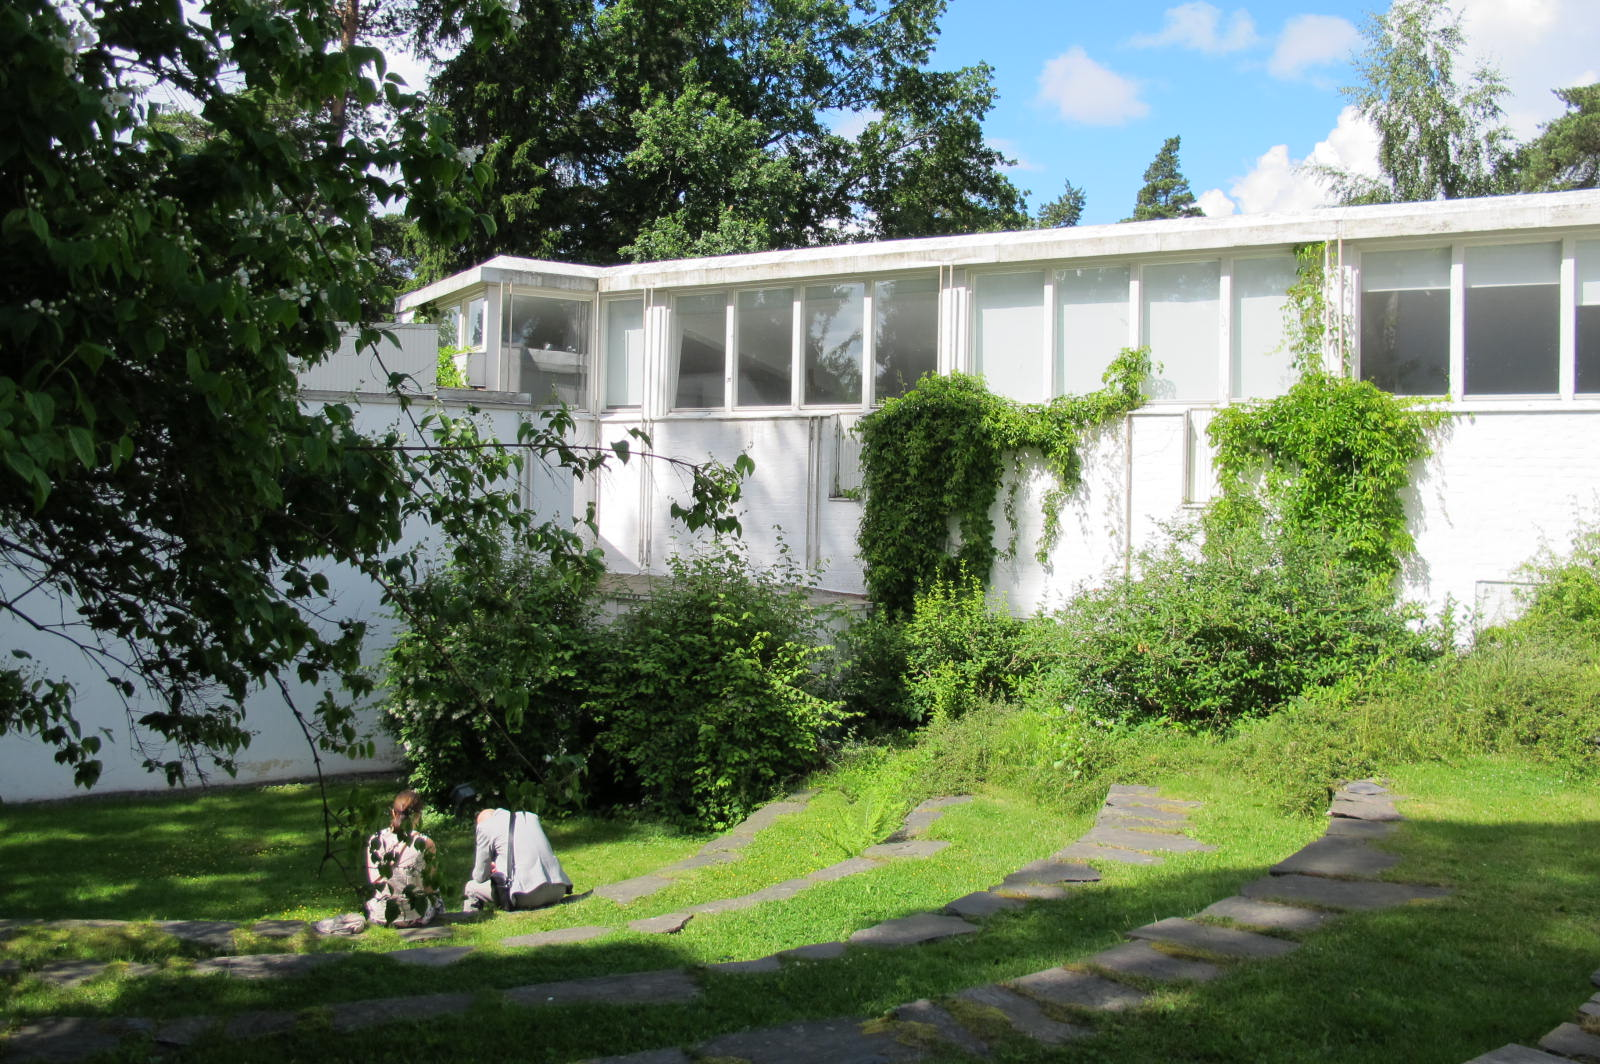 Amphitheatre / Studio Aalto / 11 July 2015